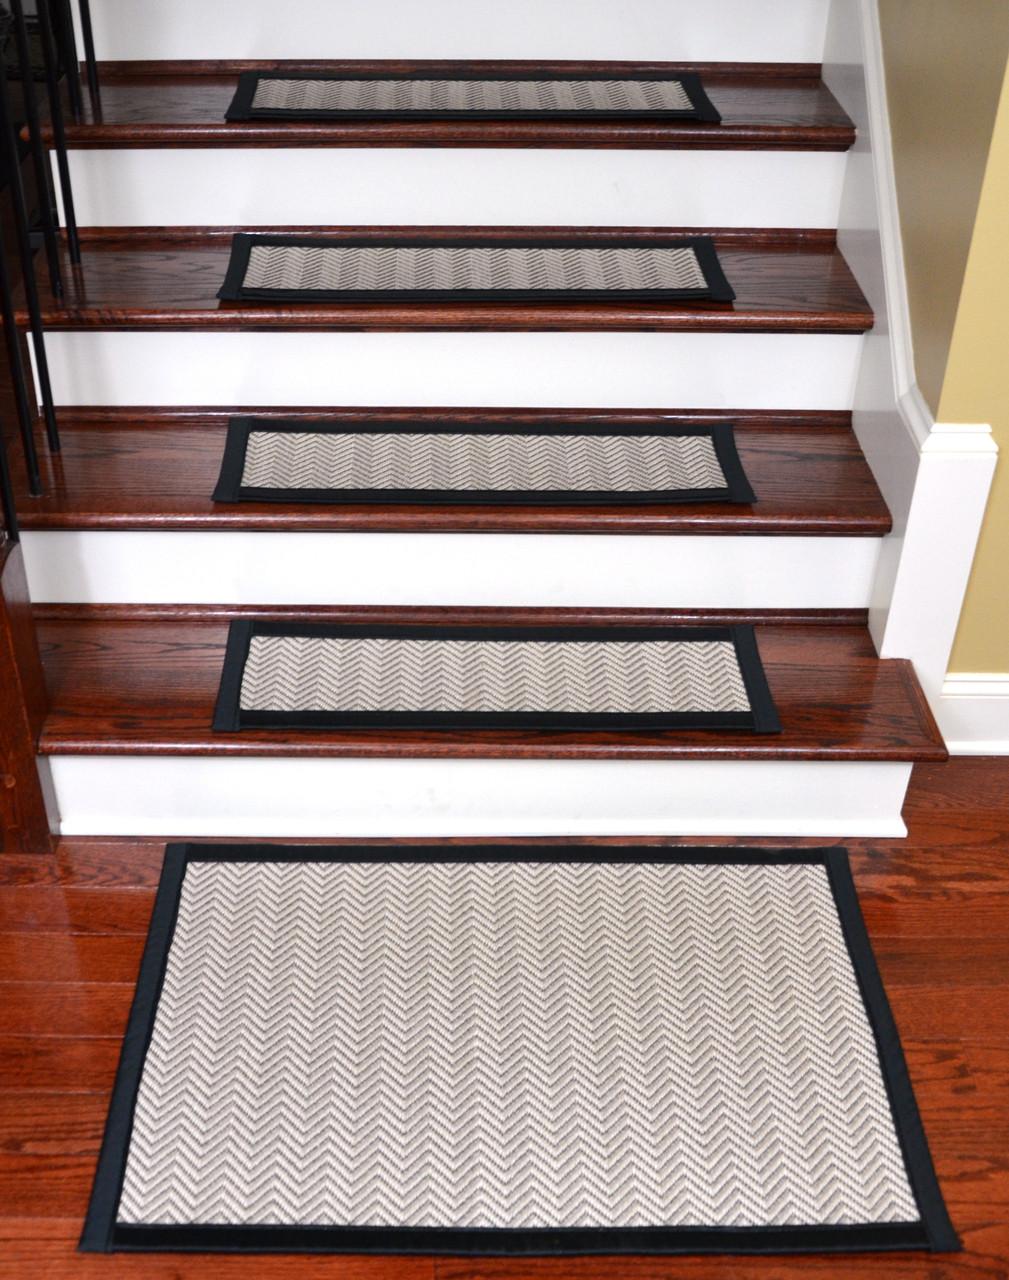 Hatteras Flatweave Stair Treads Tape Free 15 Pk